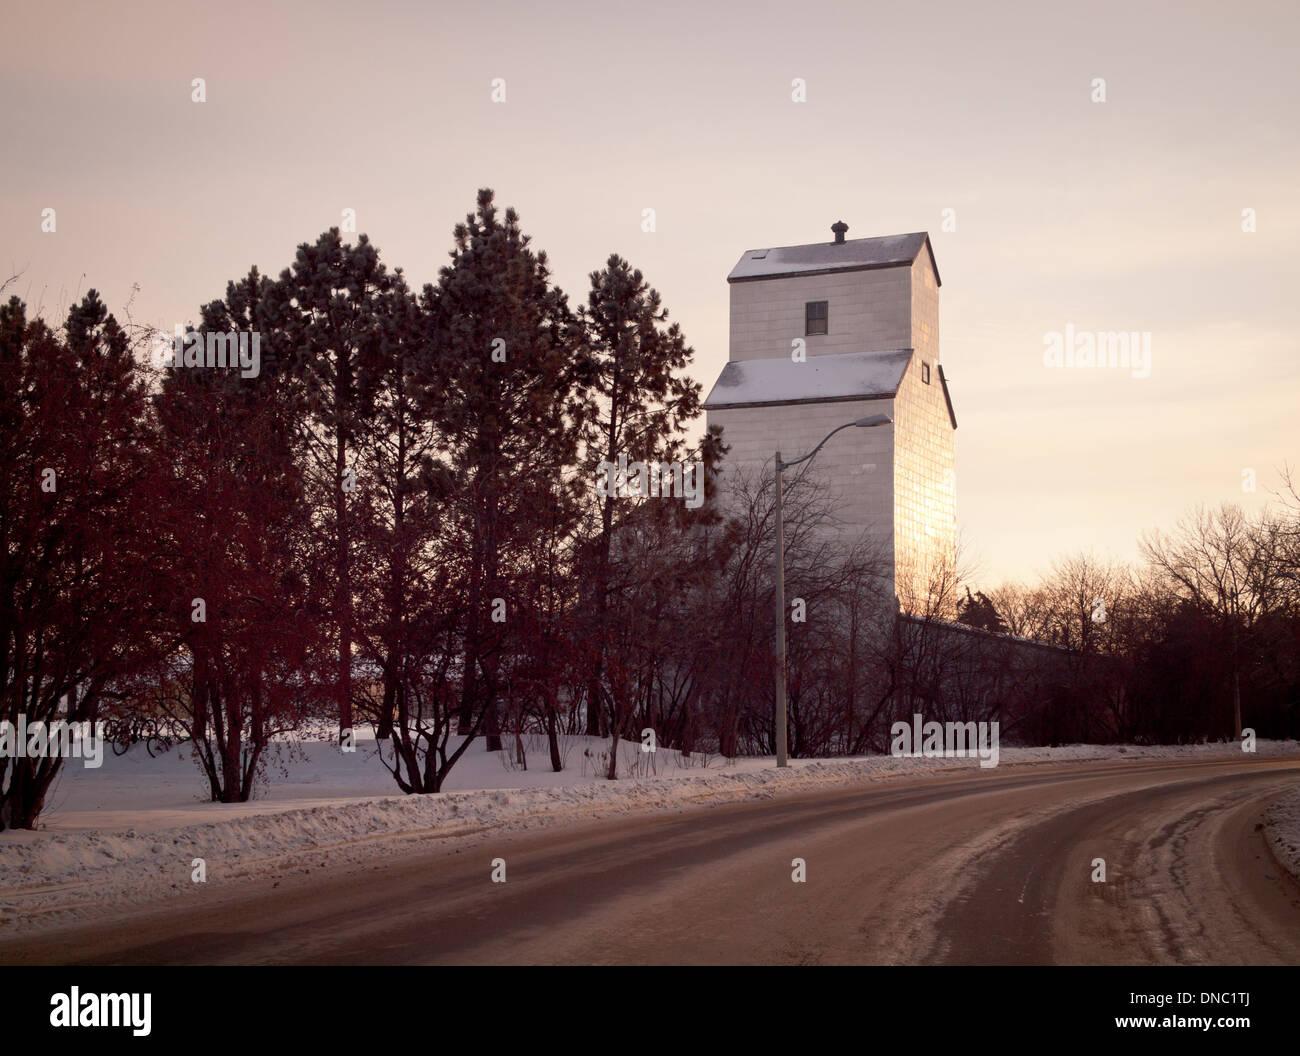 A grain elevator at the University of Saskatchewan in Saskatoon, Saskatchewan, Canada. - Stock Image